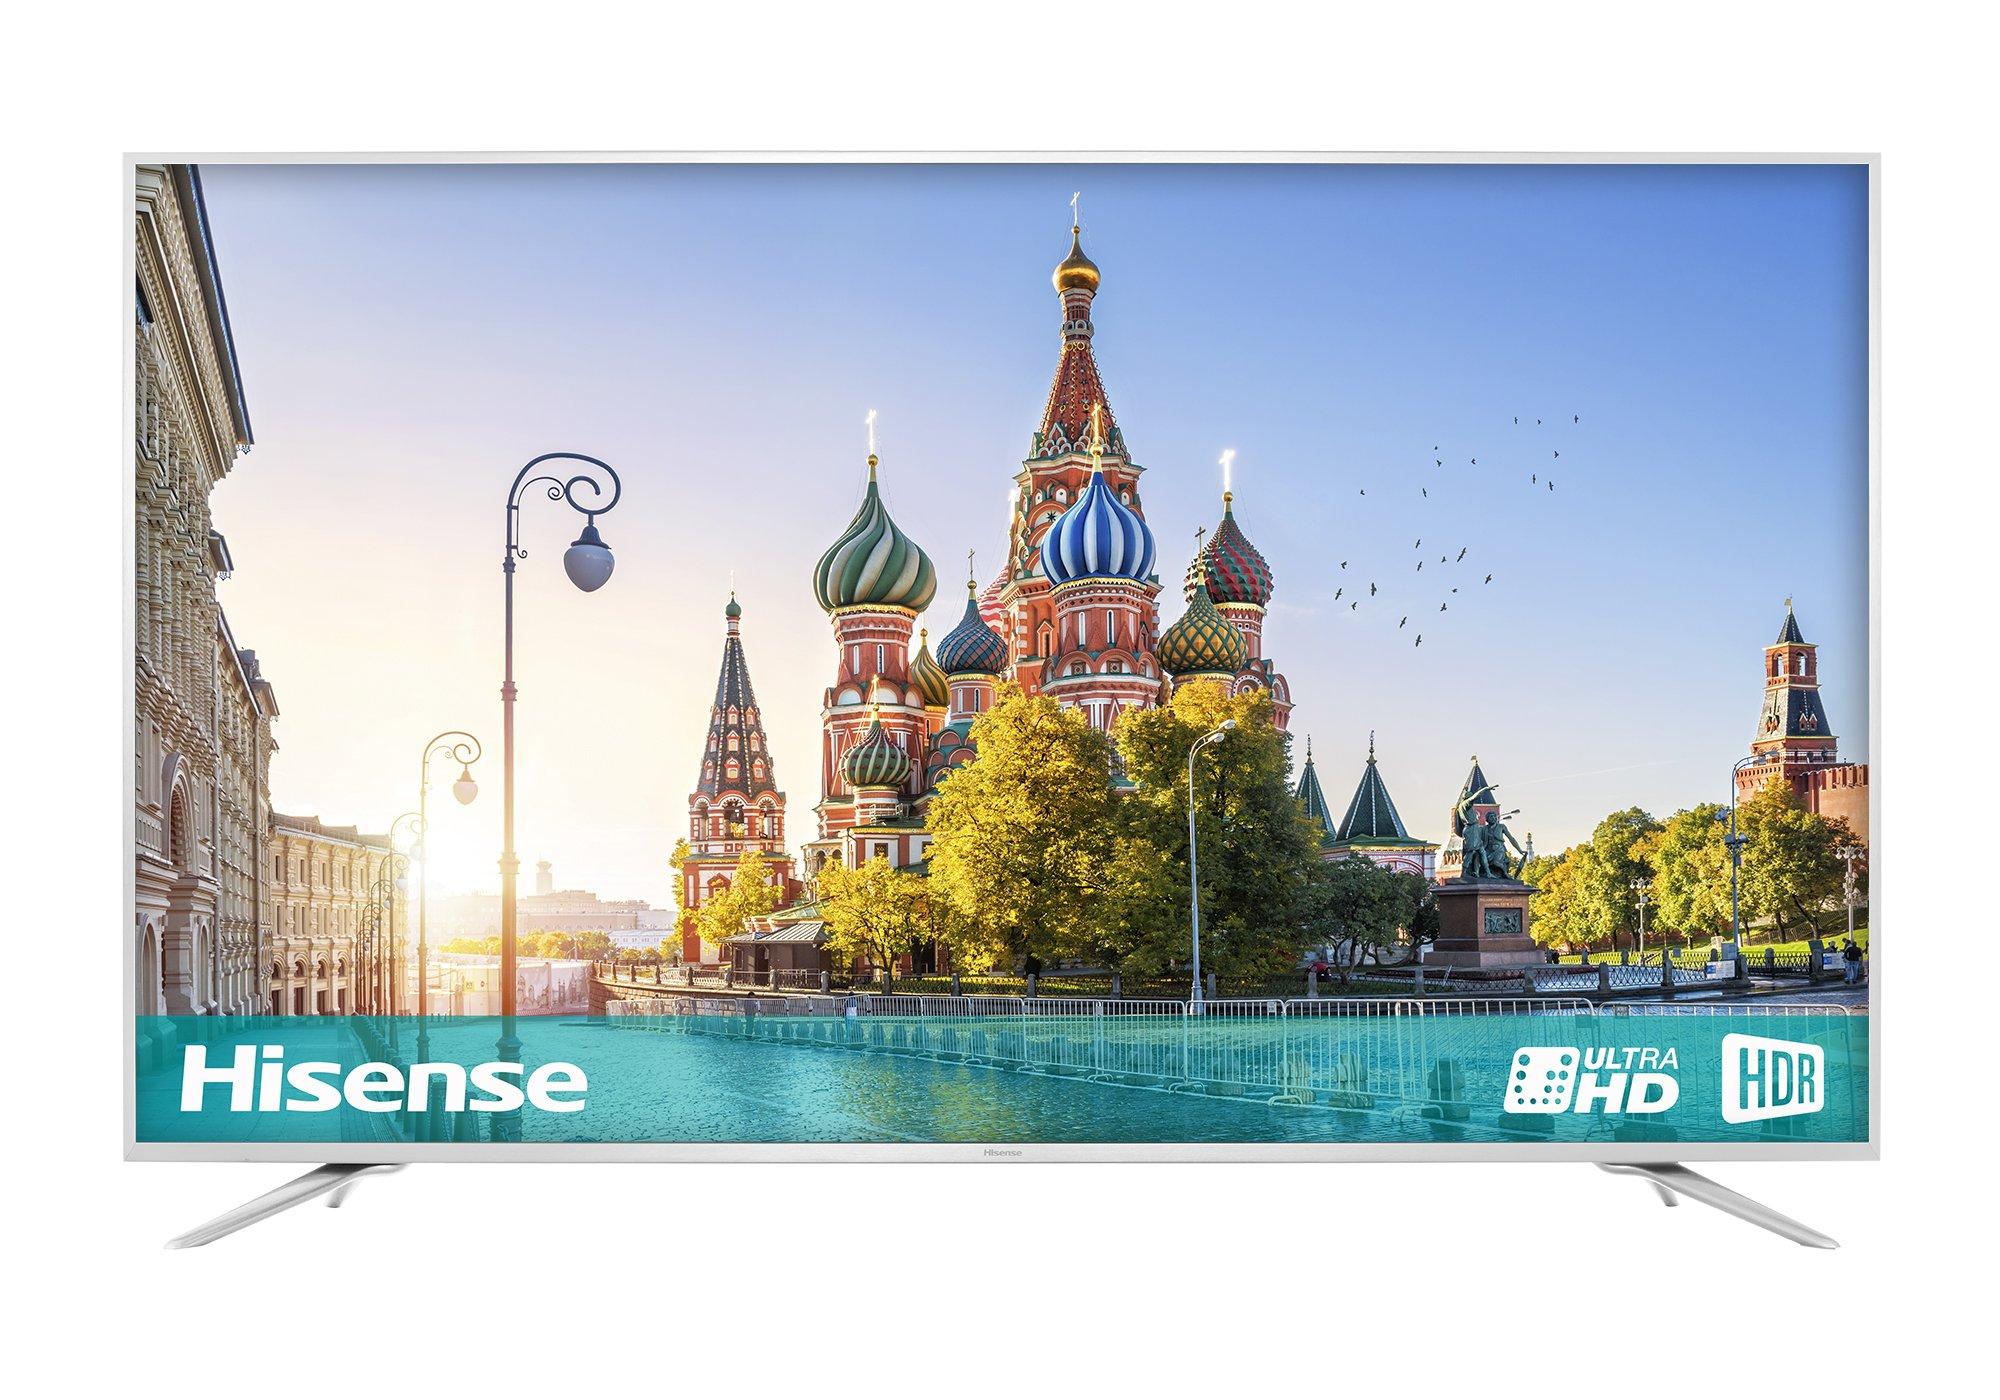 Hisense 75-h 4k Ultra HD Smart TV - Plata: Amazon.es: Electrónica